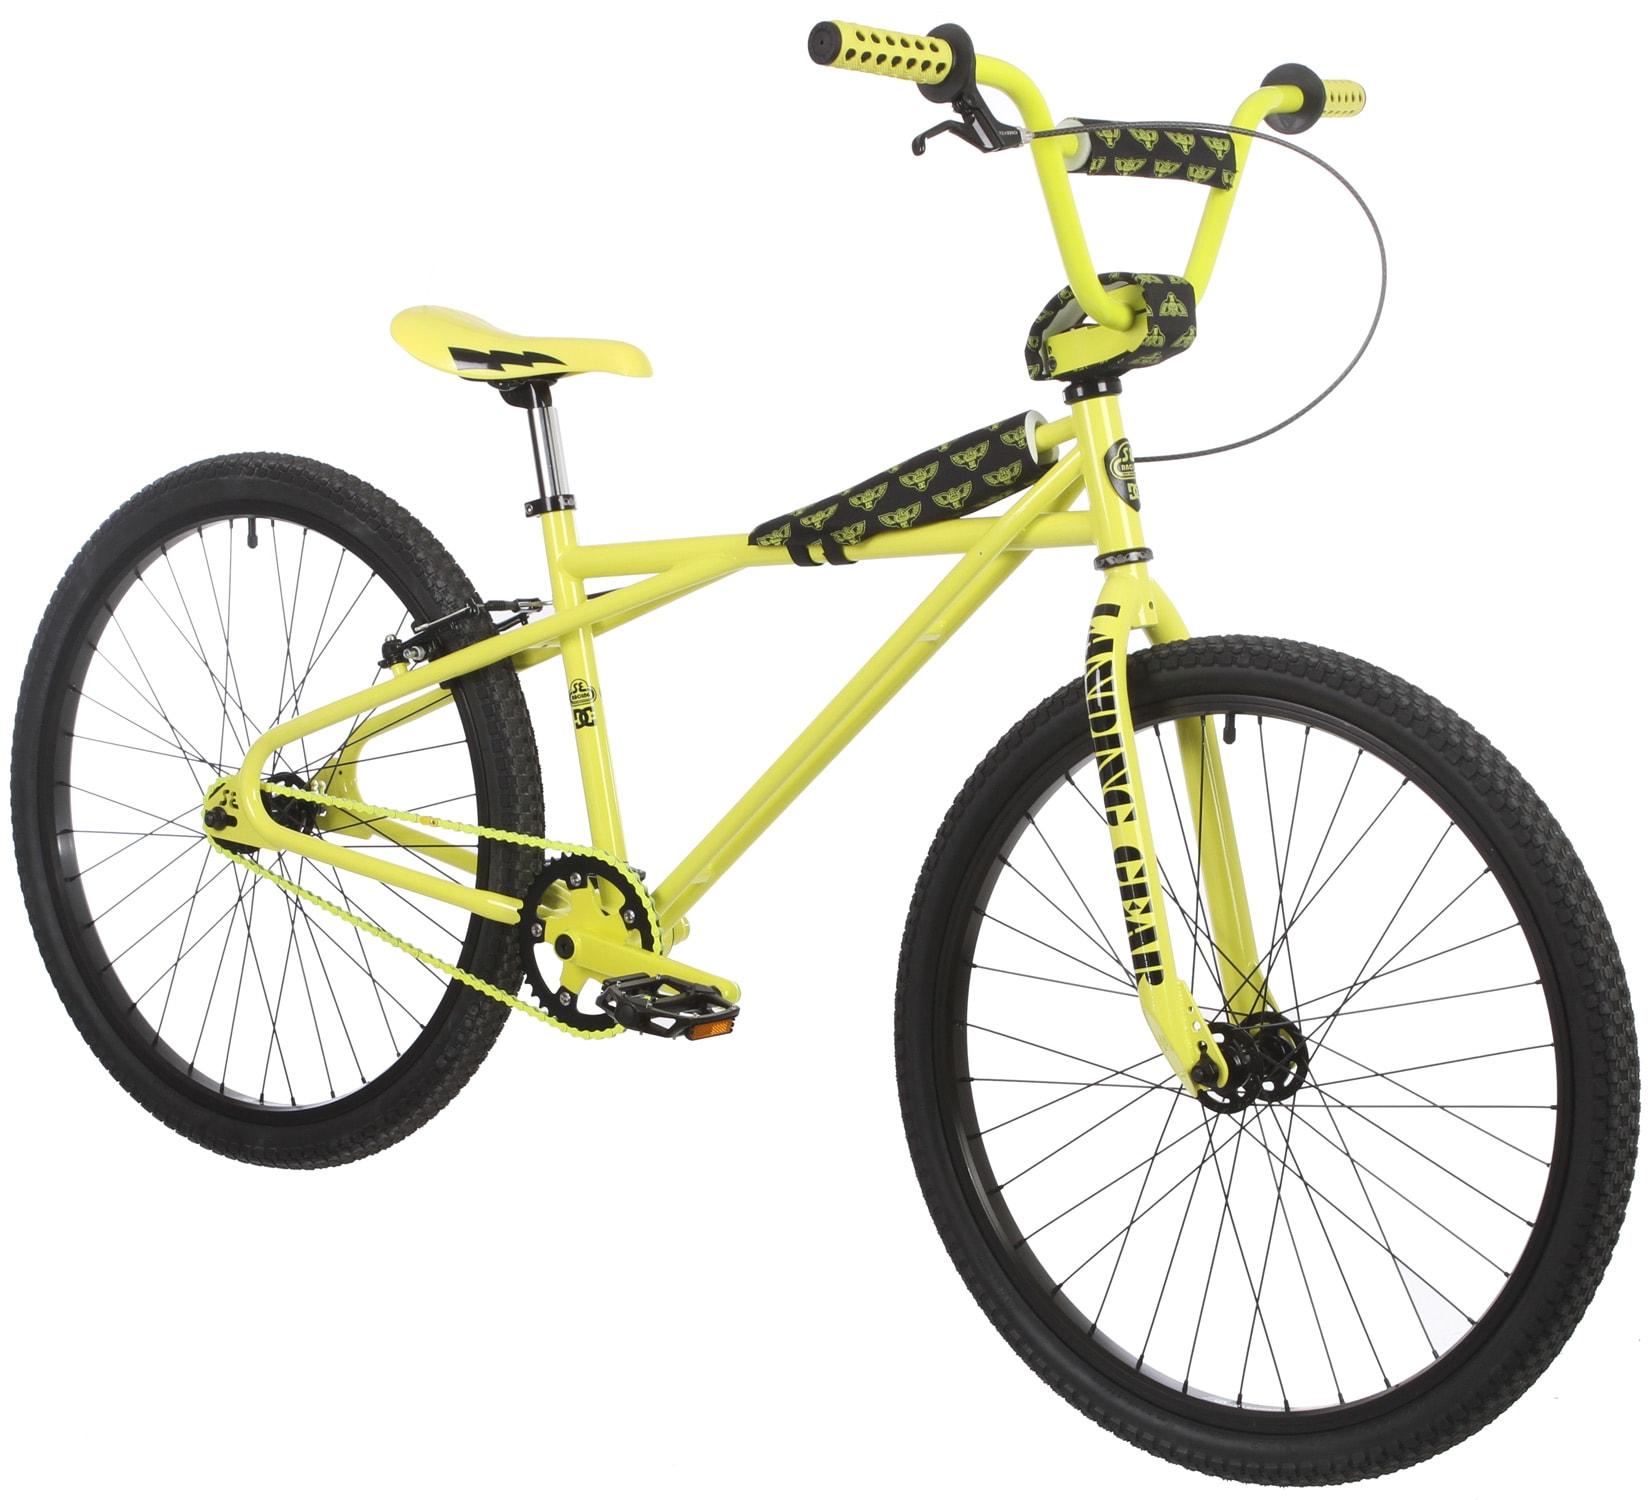 On Sale Se X Dc Quadangle Bike Up To 75 Off